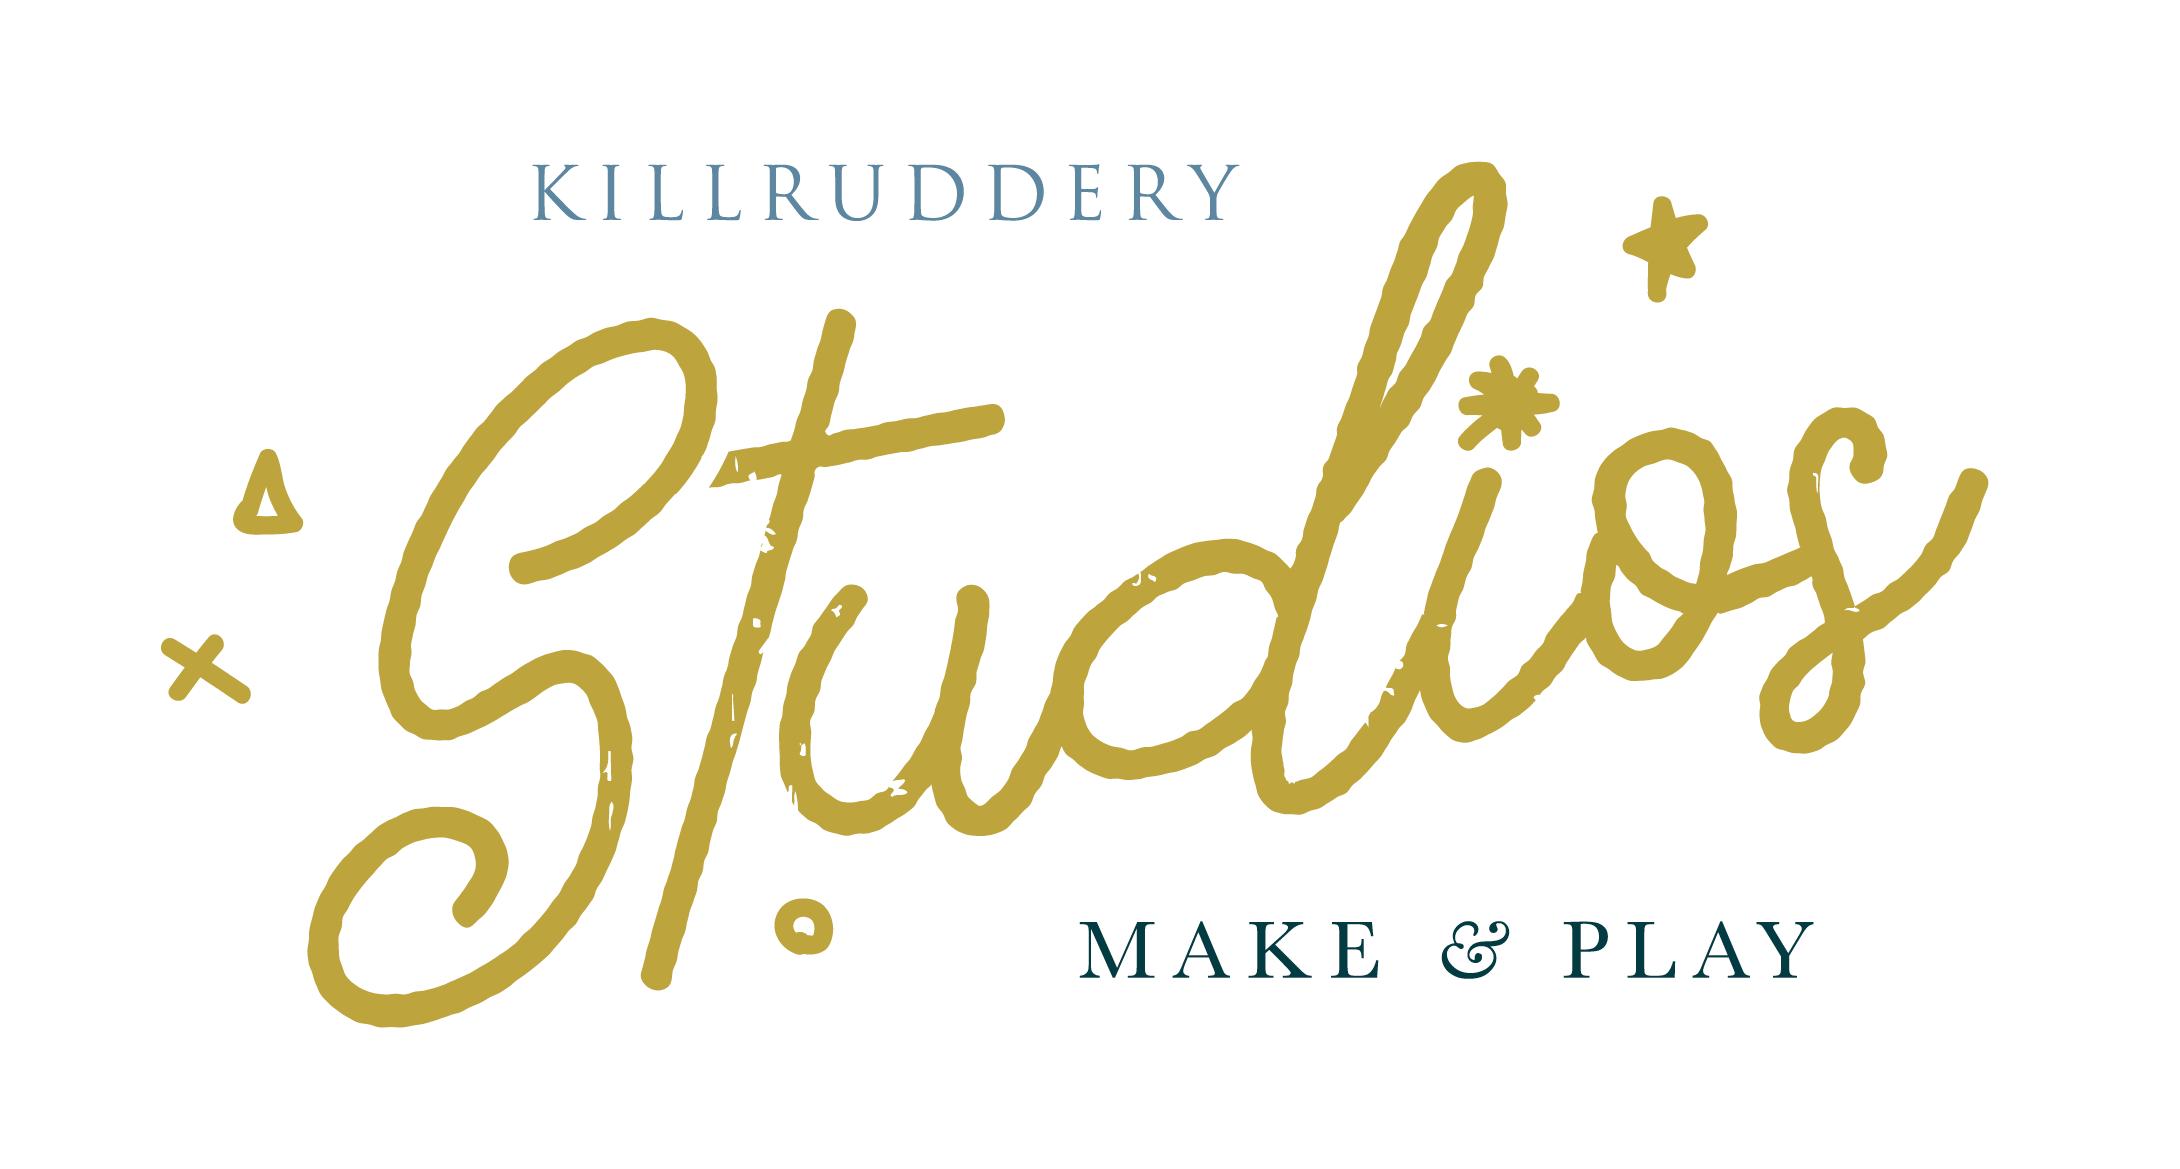 KillrudderyStudios_peak-offpeak-schedule_may-jun-19.png